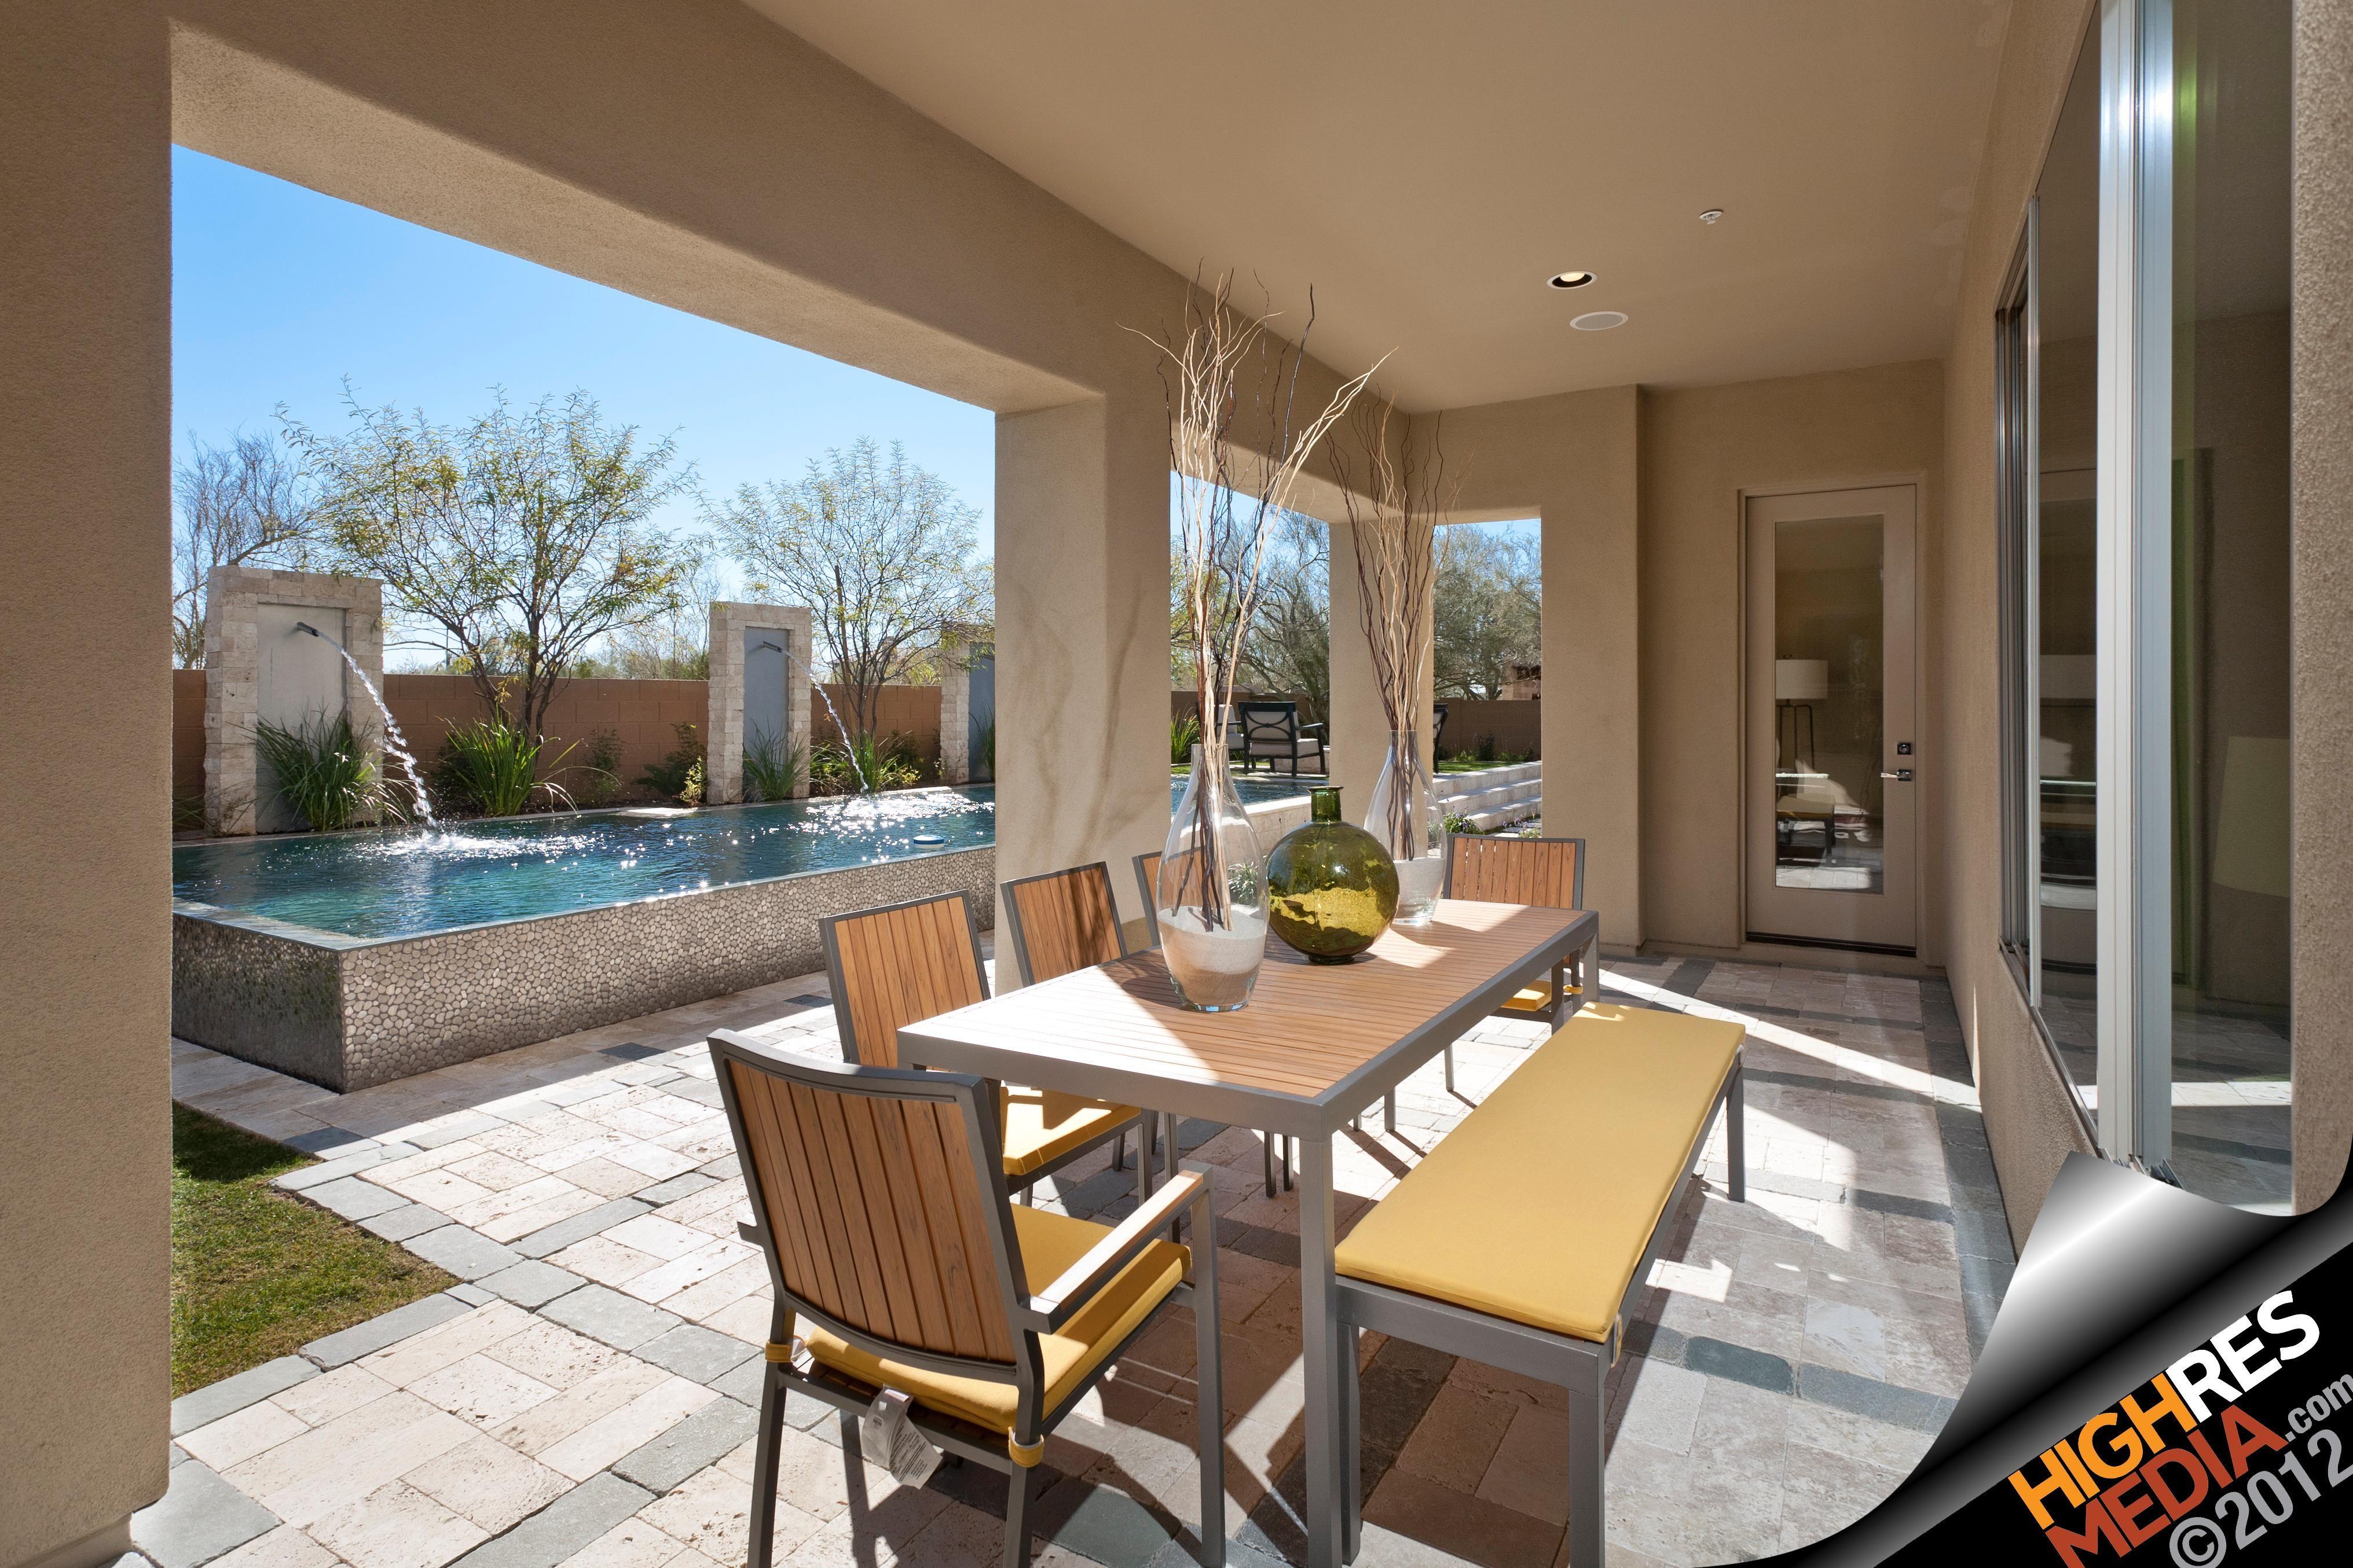 Luxury patio and backyard   HOME!! ⚓️   Pinterest on Luxury Backyard Patios id=48781